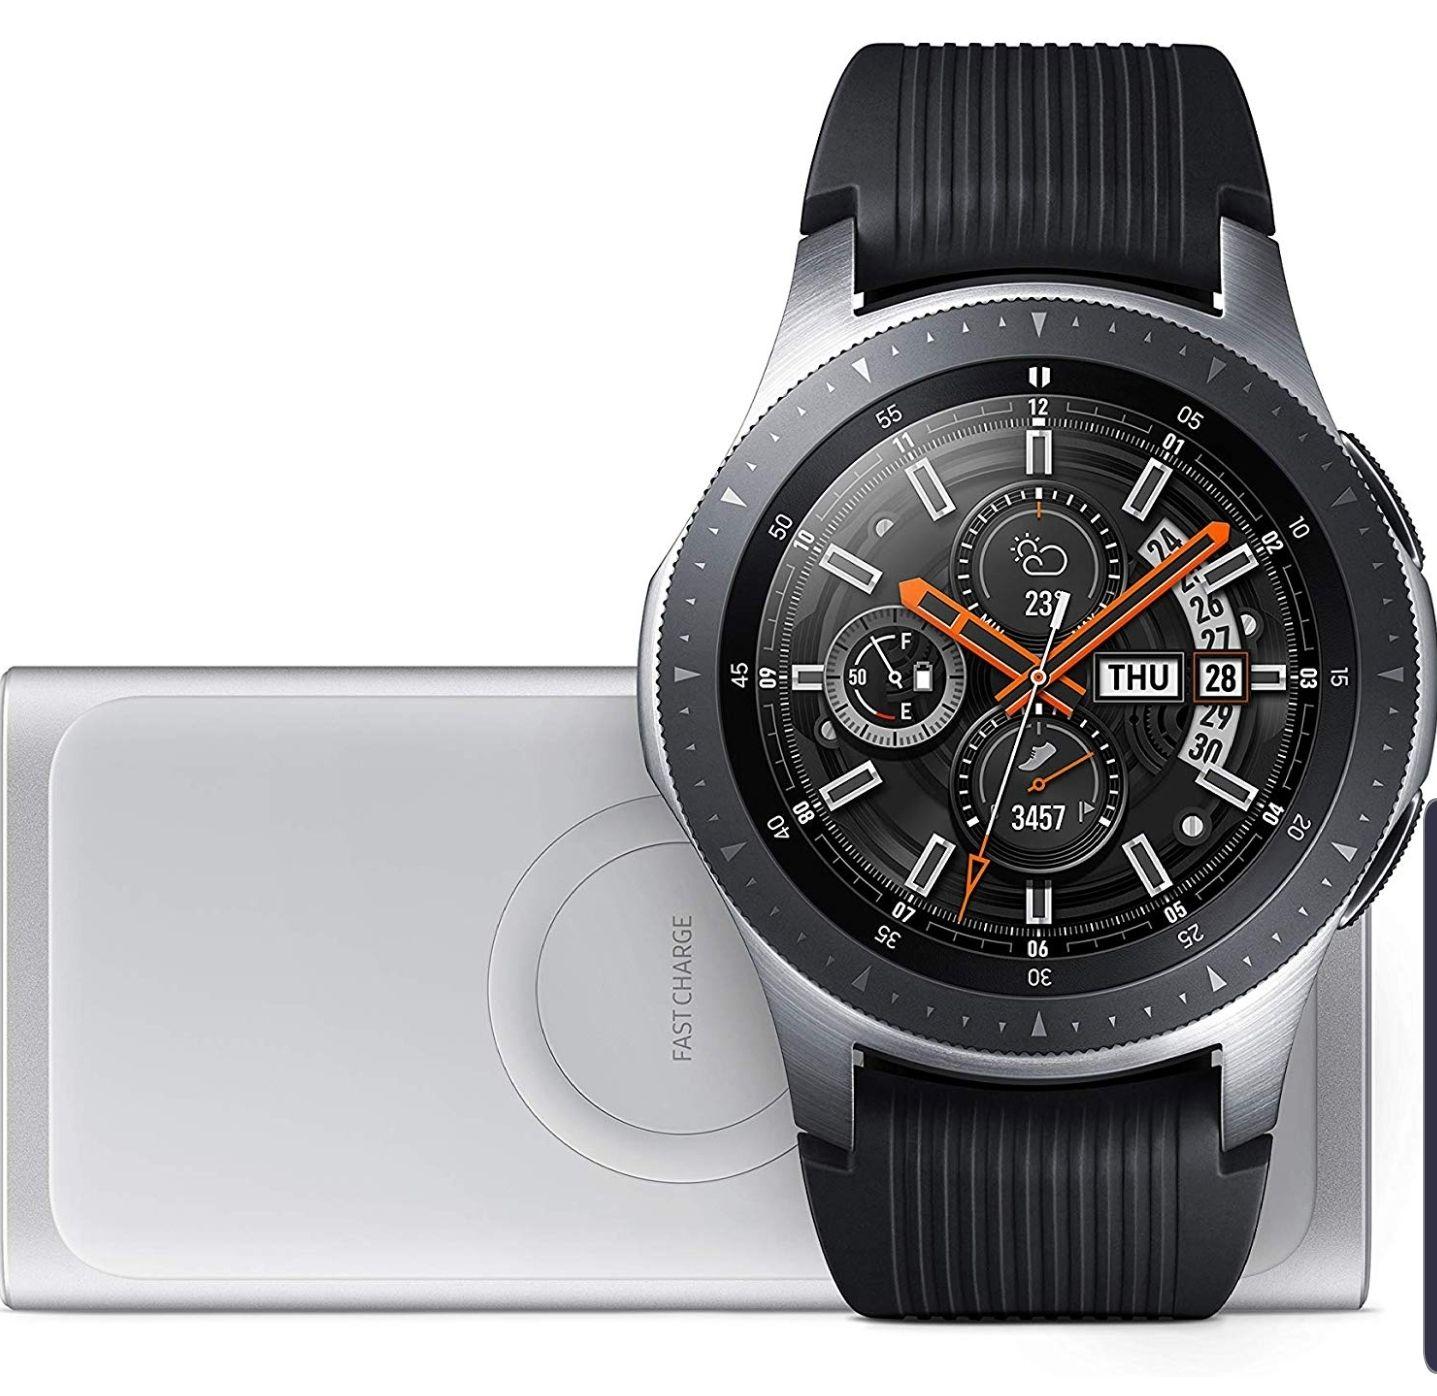 Galaxy watch 46mm. + Inductieve powerbank